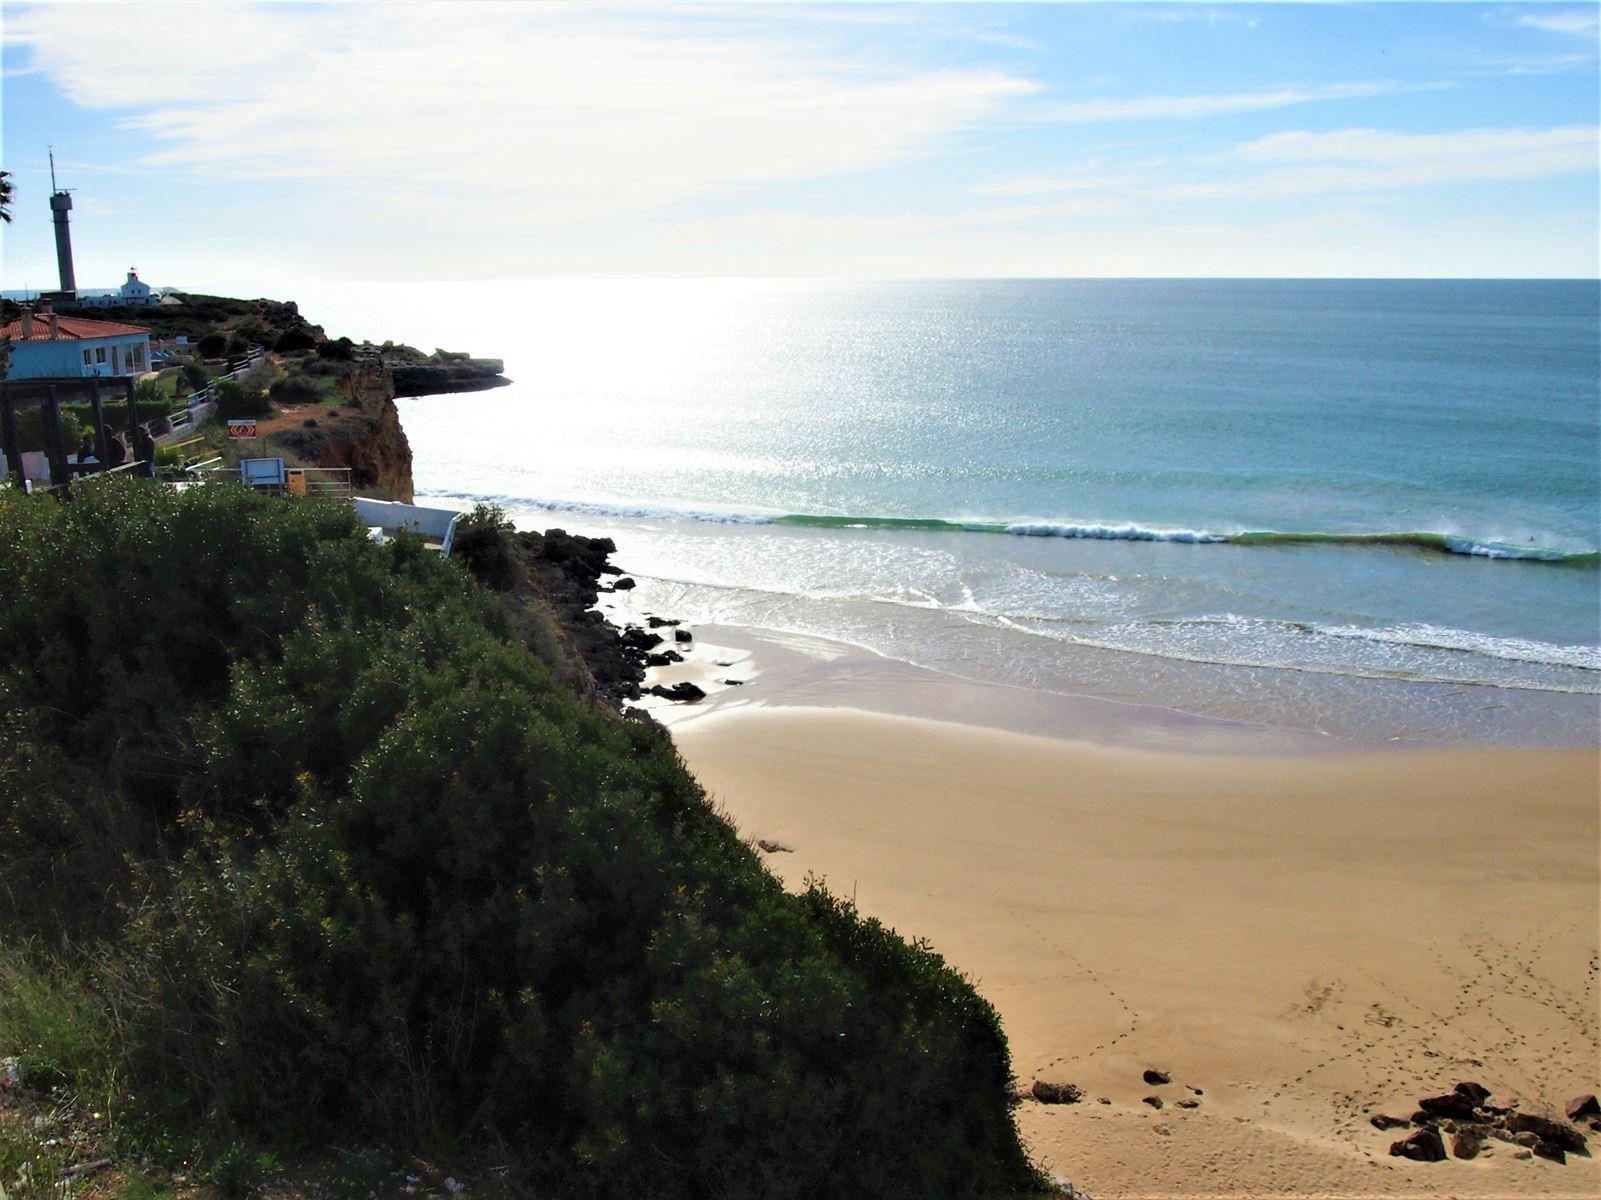 Praia do Molhe, Ferragudo, Algarve